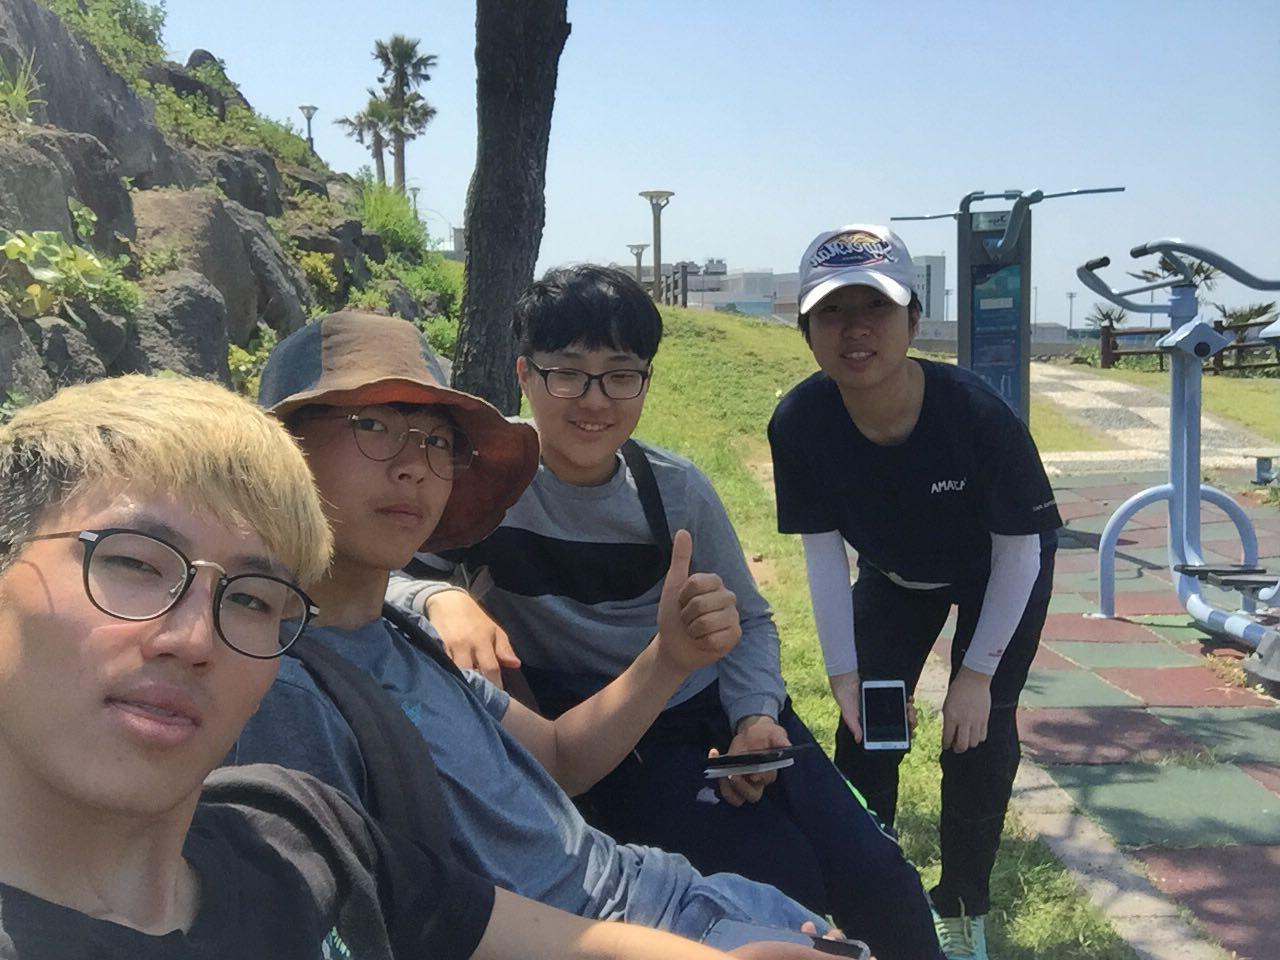 photo_2017-05-29_14-07-19.jpg